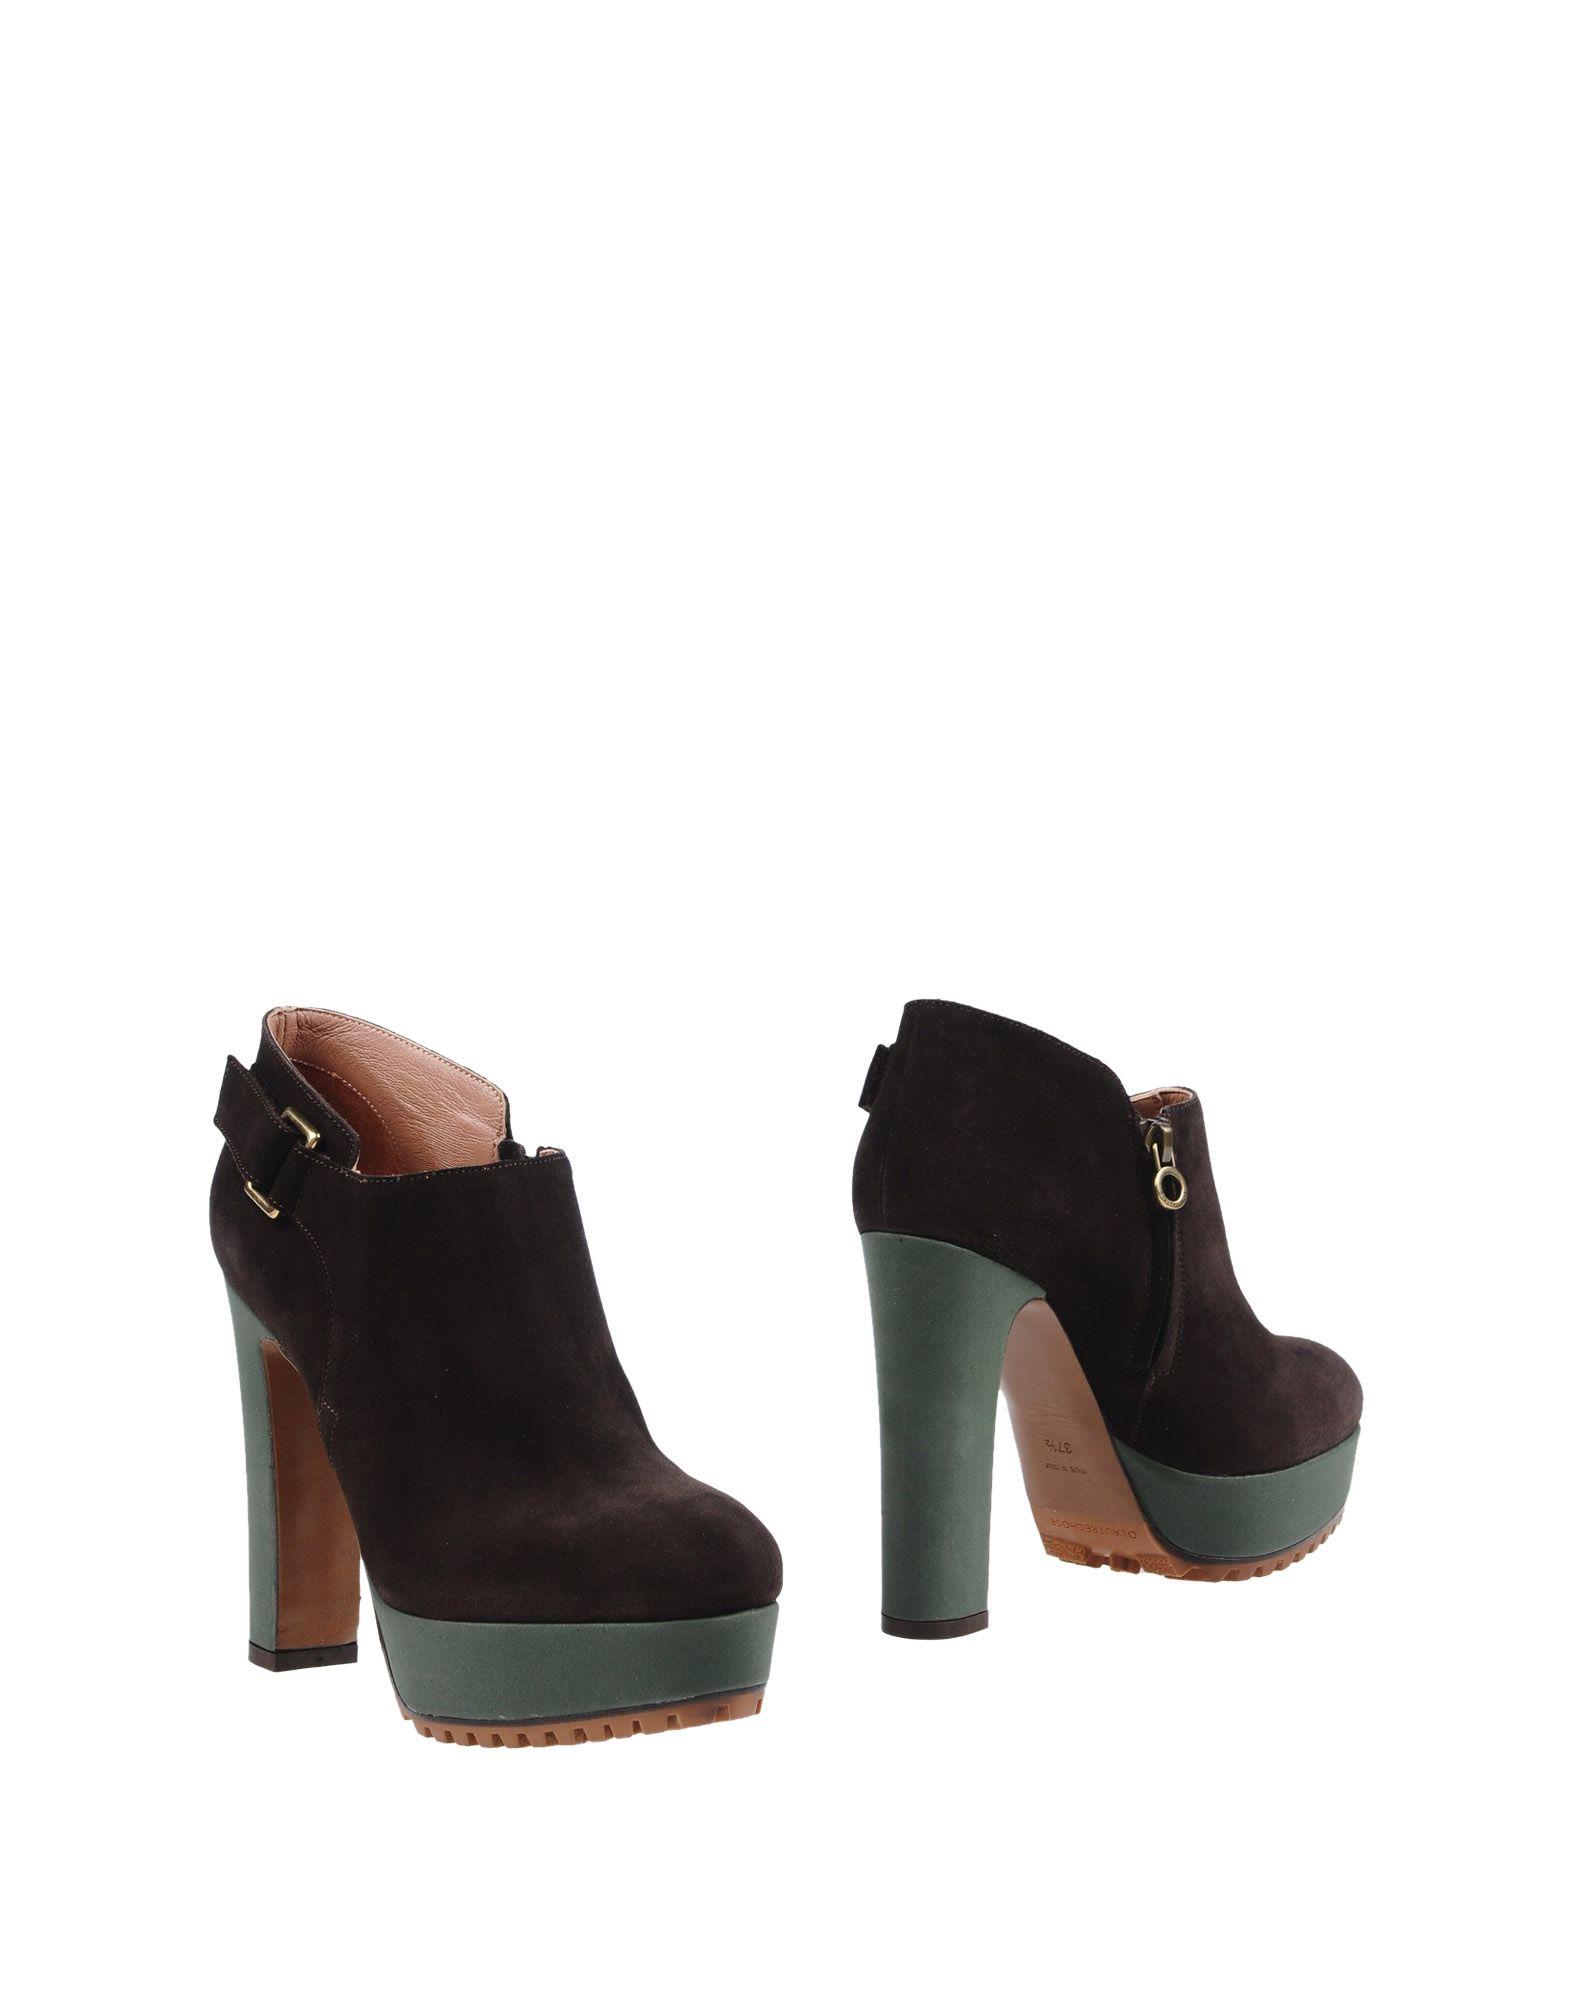 L' Autre Chose Stiefelette Damen  11257211RTGut aussehende strapazierfähige Schuhe